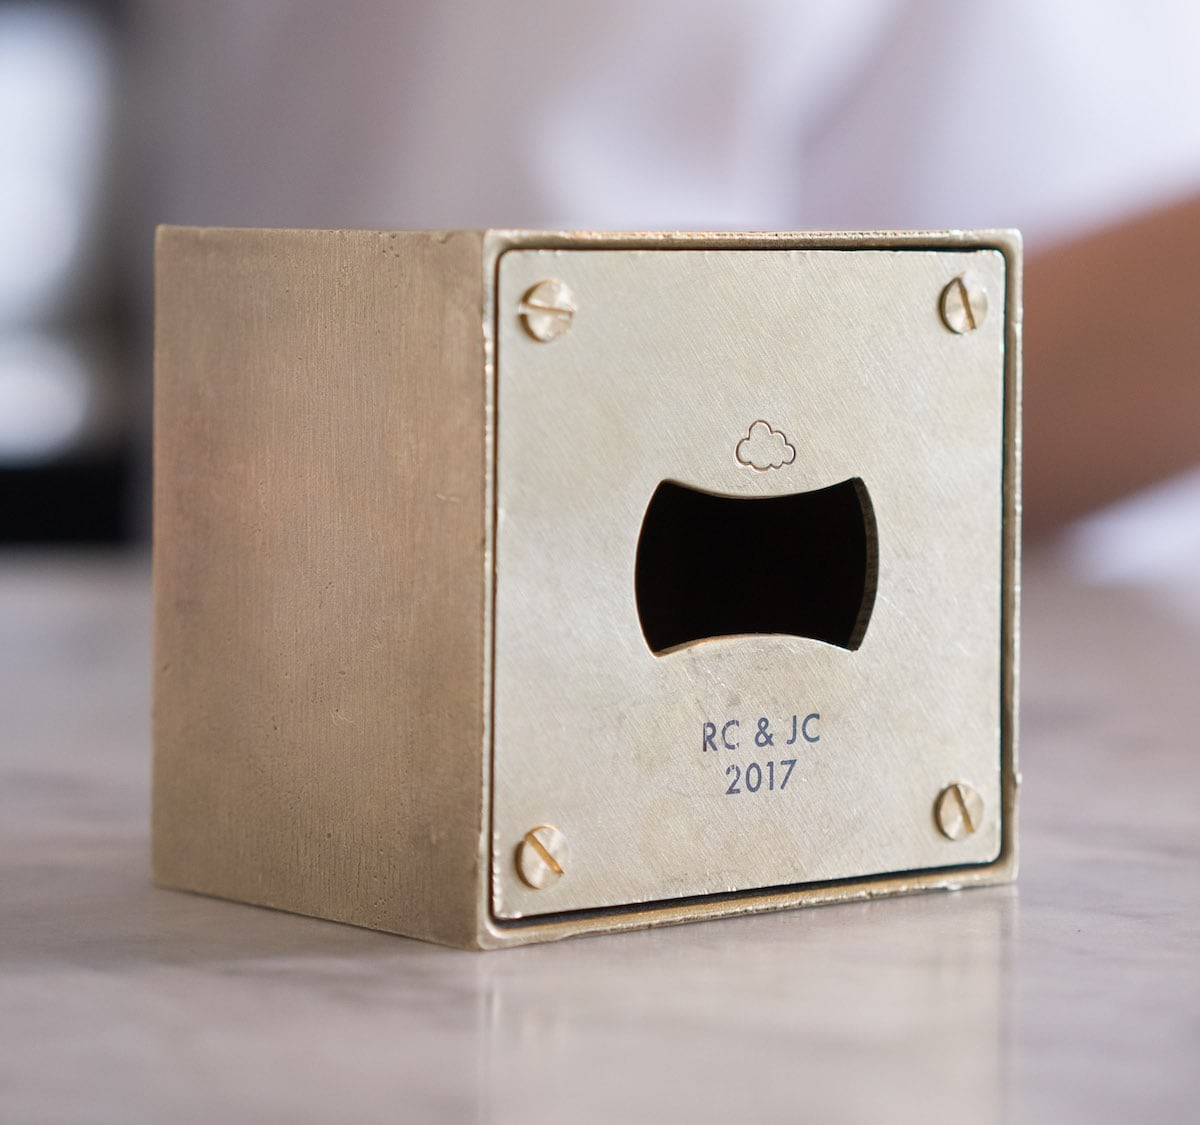 Richard Clarkson Studio Bloc Brass Block Bottle Opener blends form and function